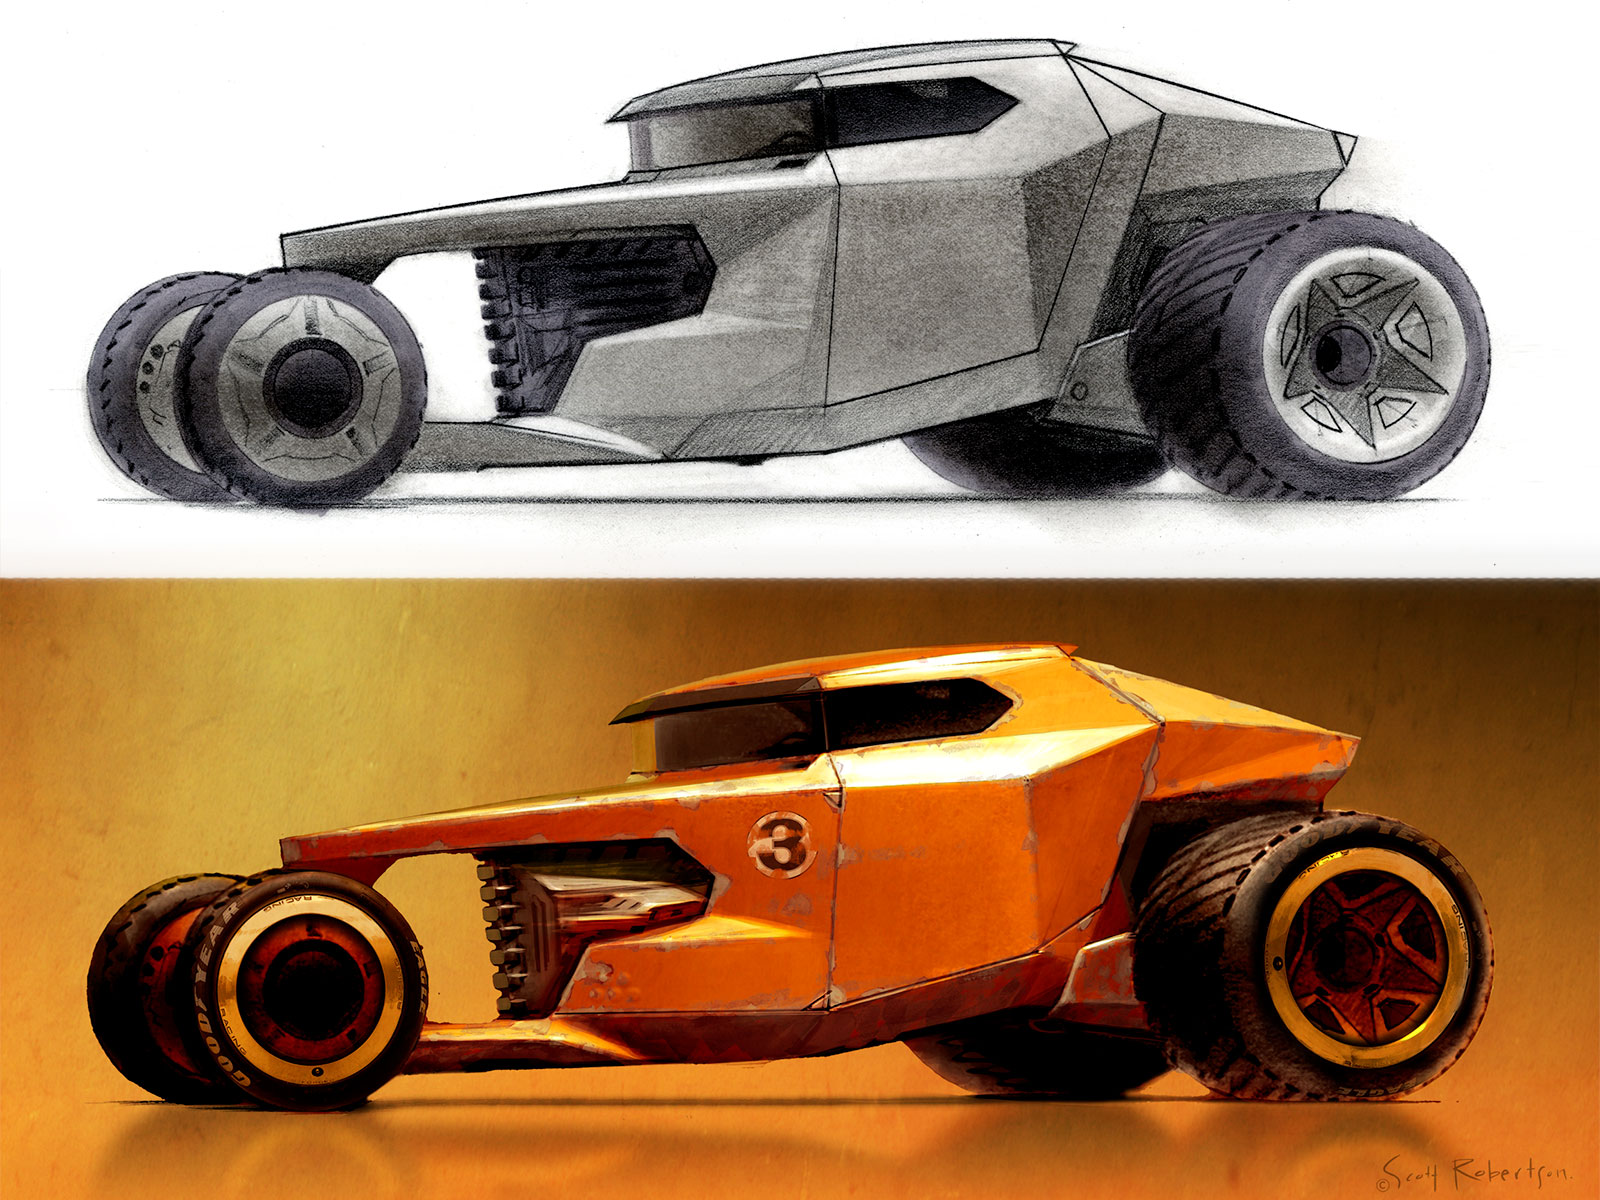 futuristic hot rod concept by scott robertson